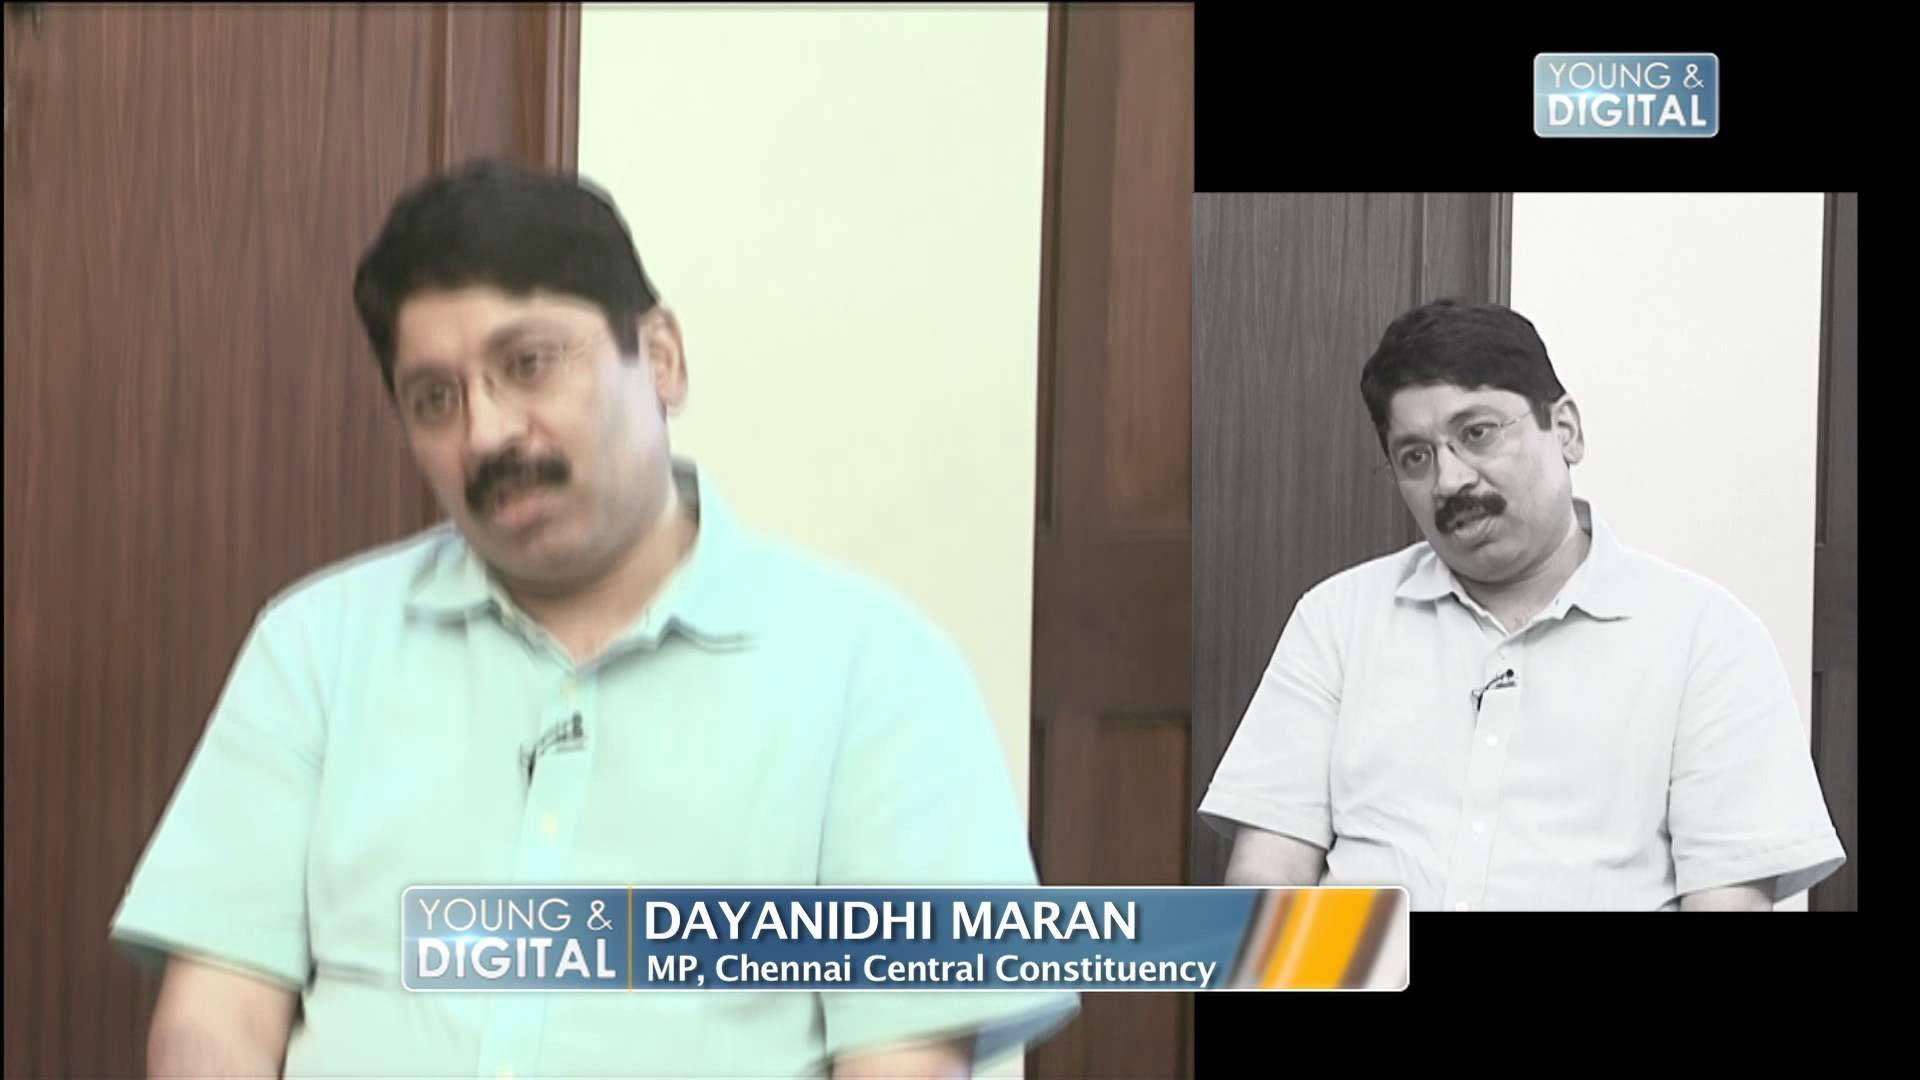 Dayanidhi Maran Mp Chennai Central Constituency Young Digital Chennai Maran Young